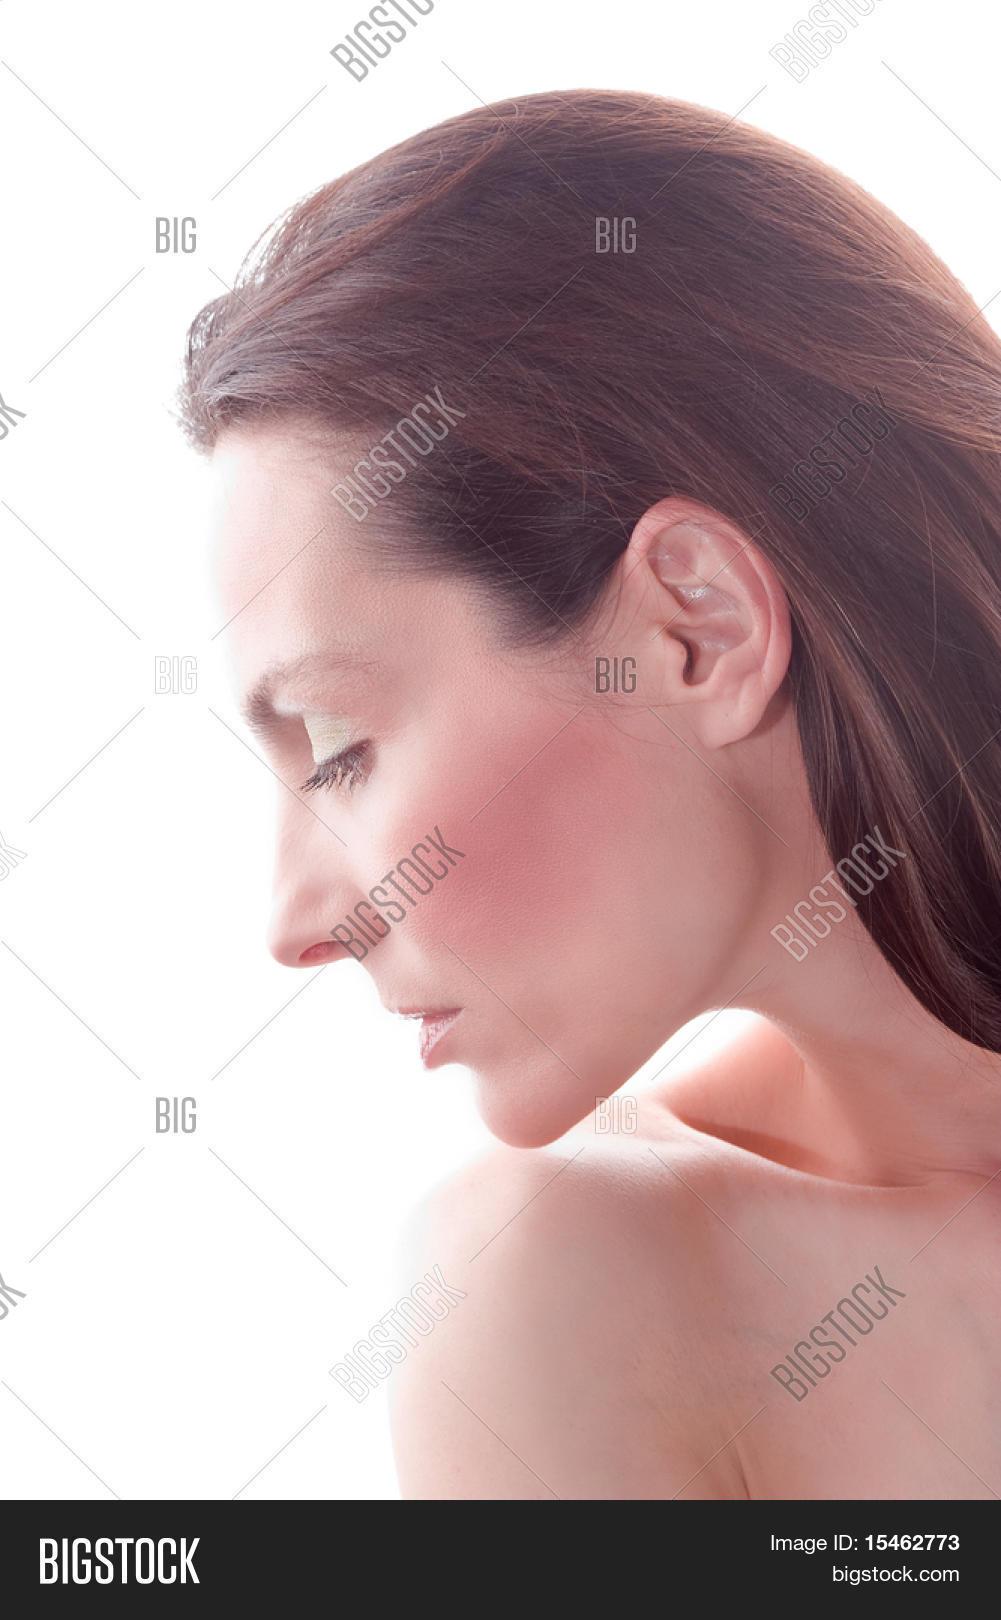 woman face profile view studio image photo bigstock. Black Bedroom Furniture Sets. Home Design Ideas